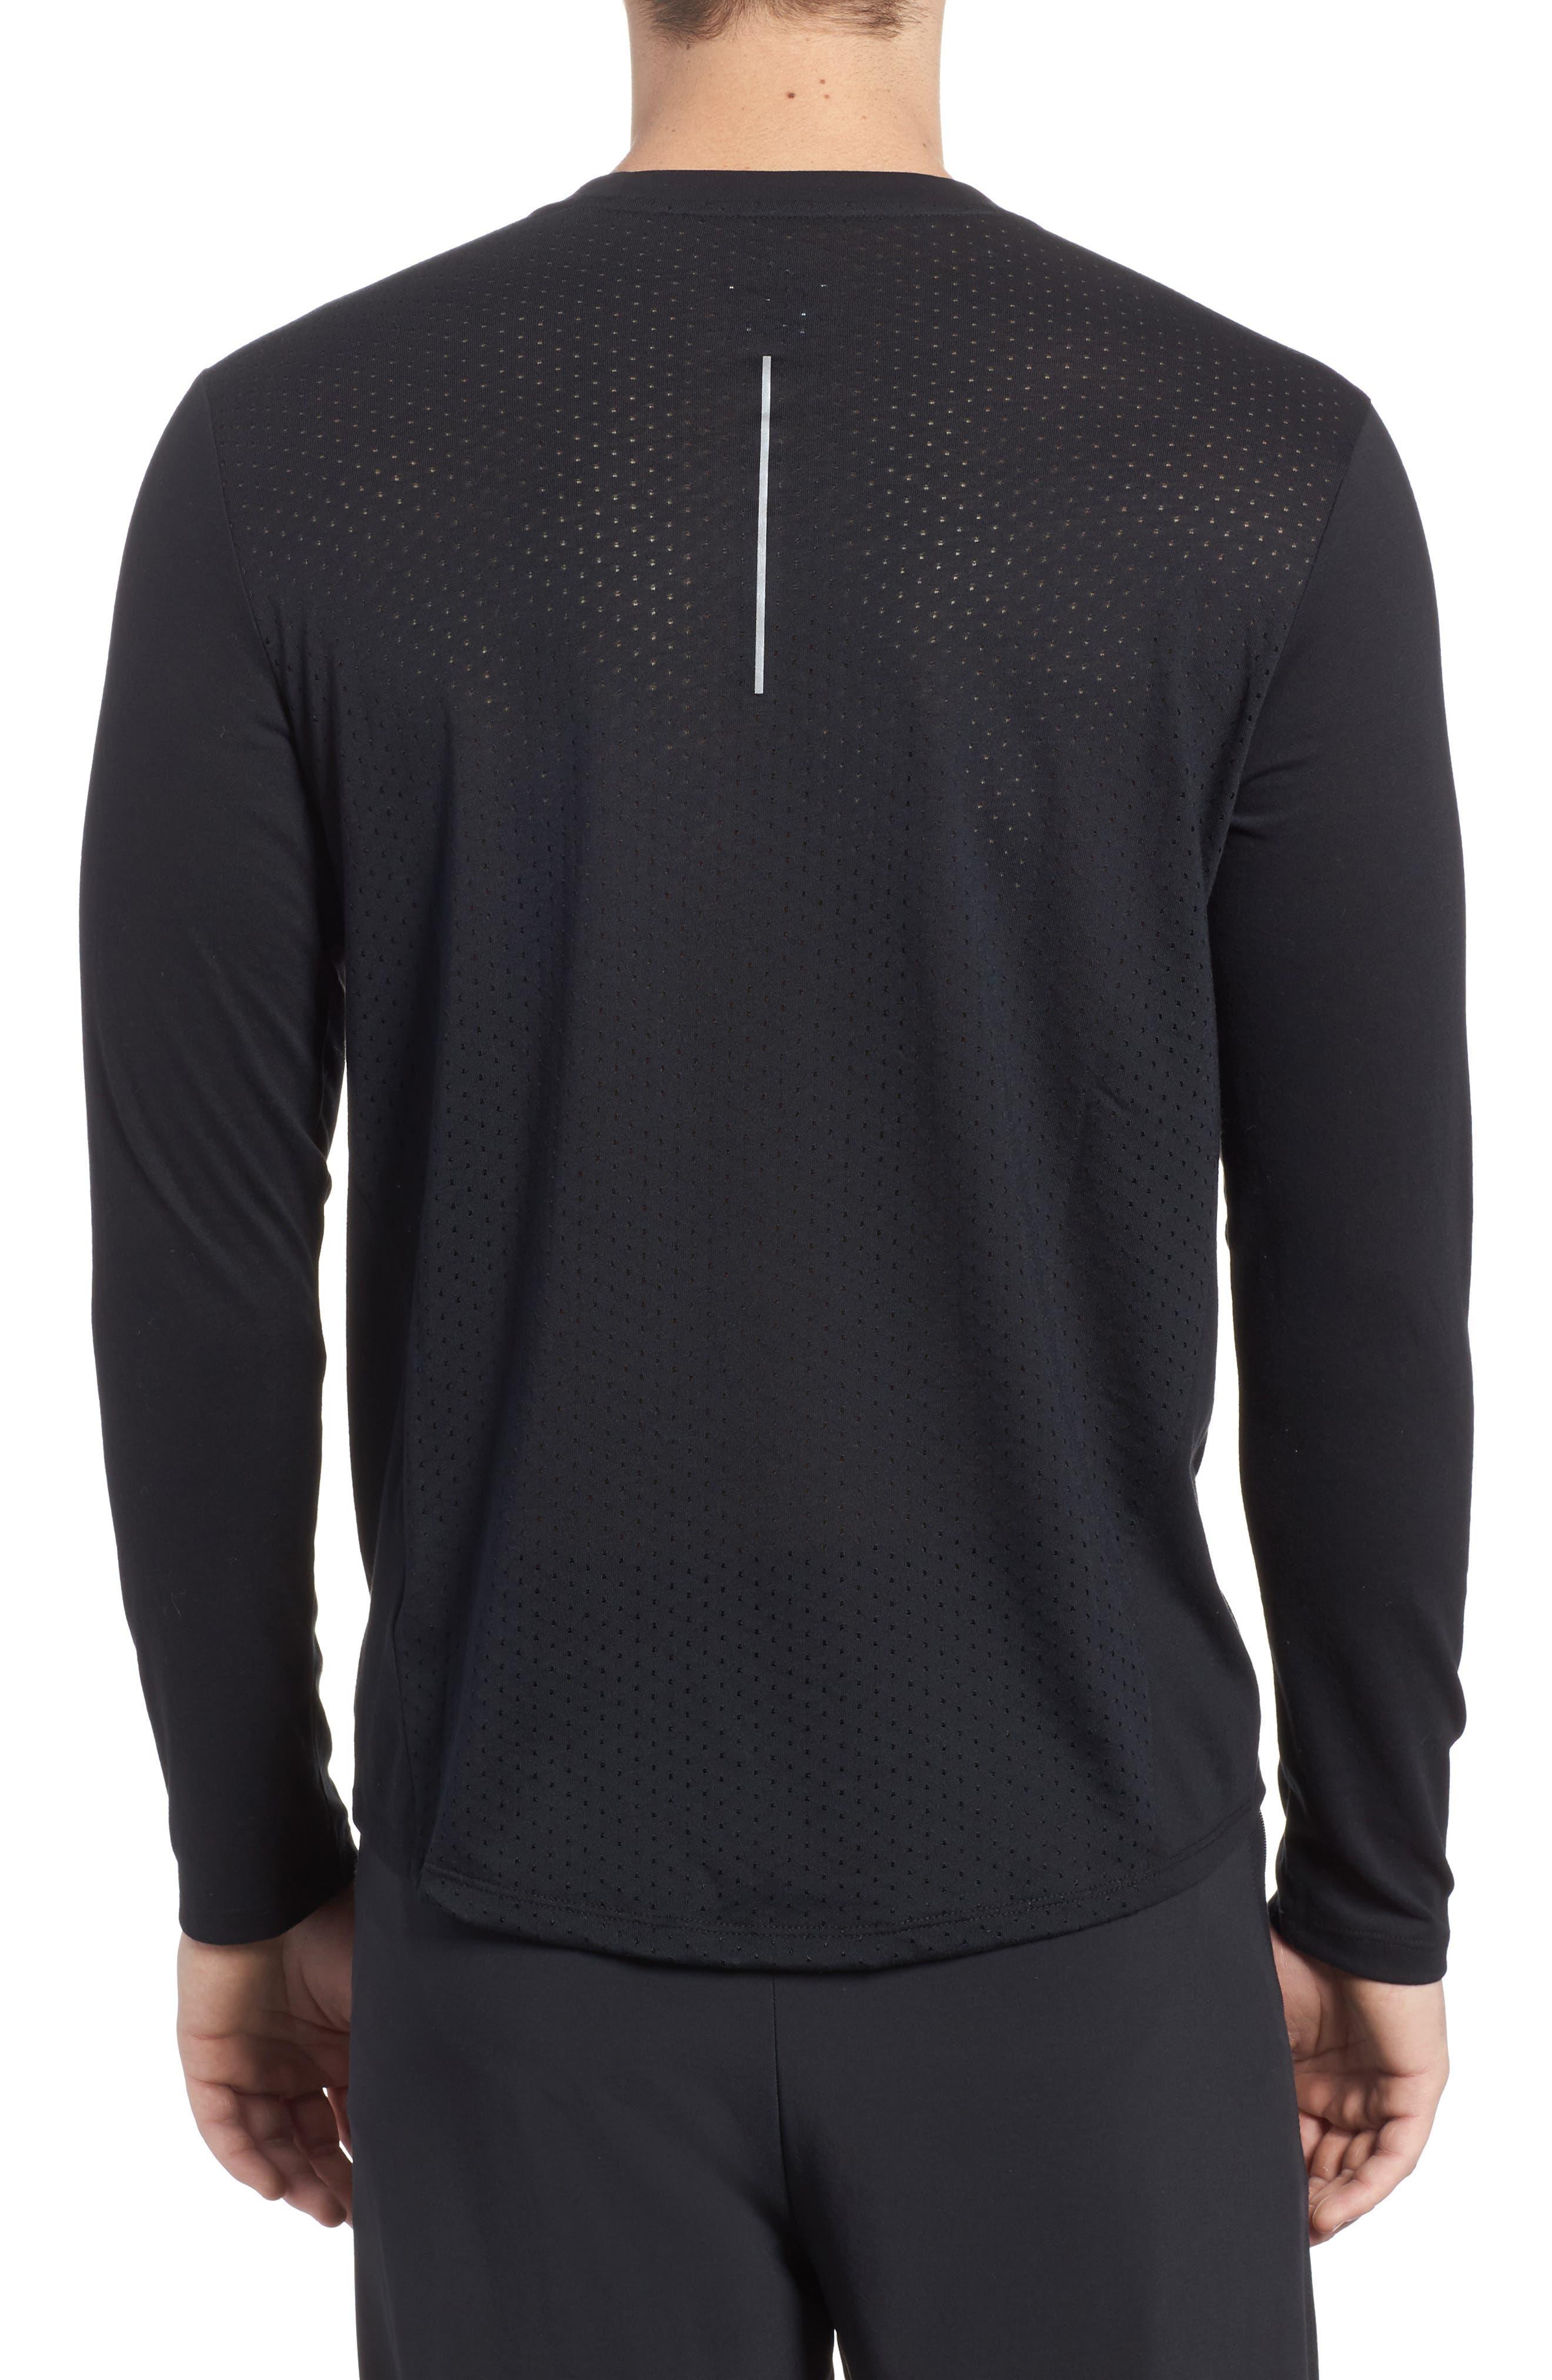 Tailwind Long Sleeve Running T-Shirt,                             Alternate thumbnail 2, color,                             010